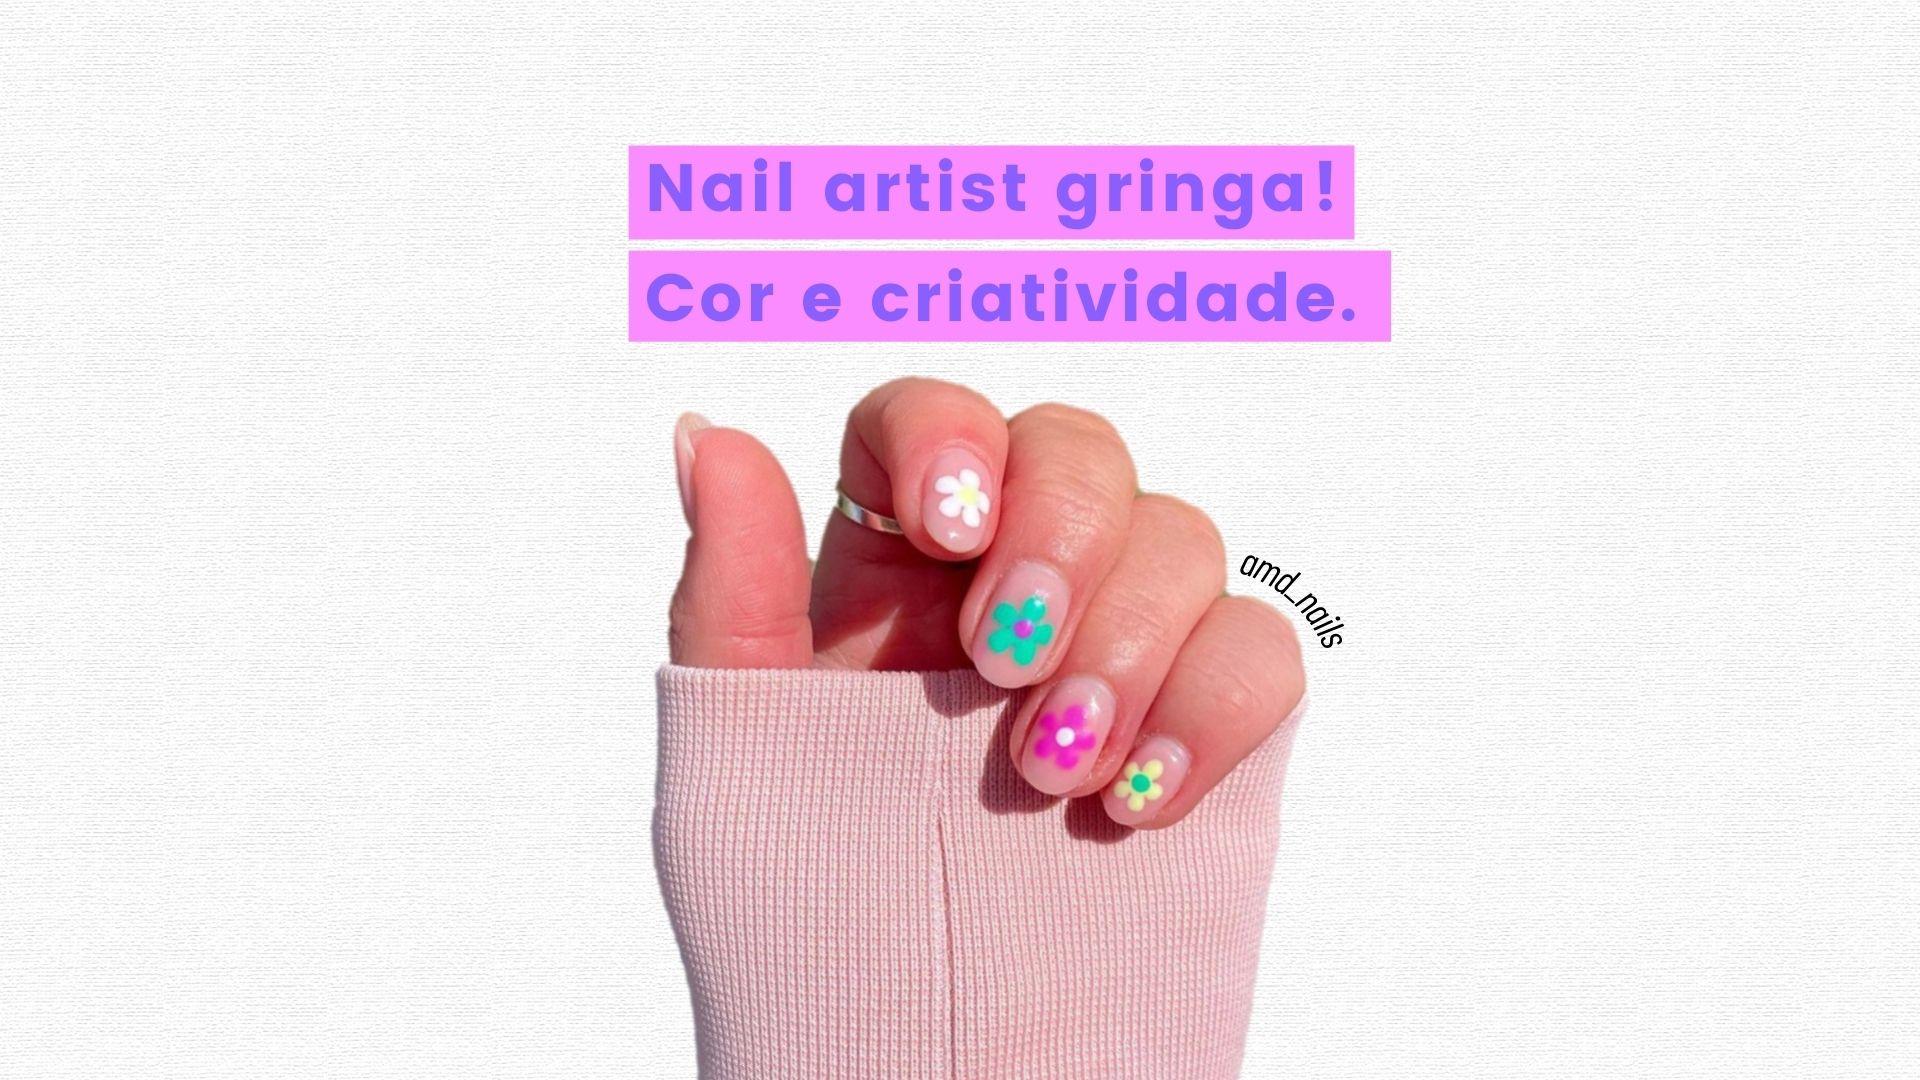 nail artist gringa